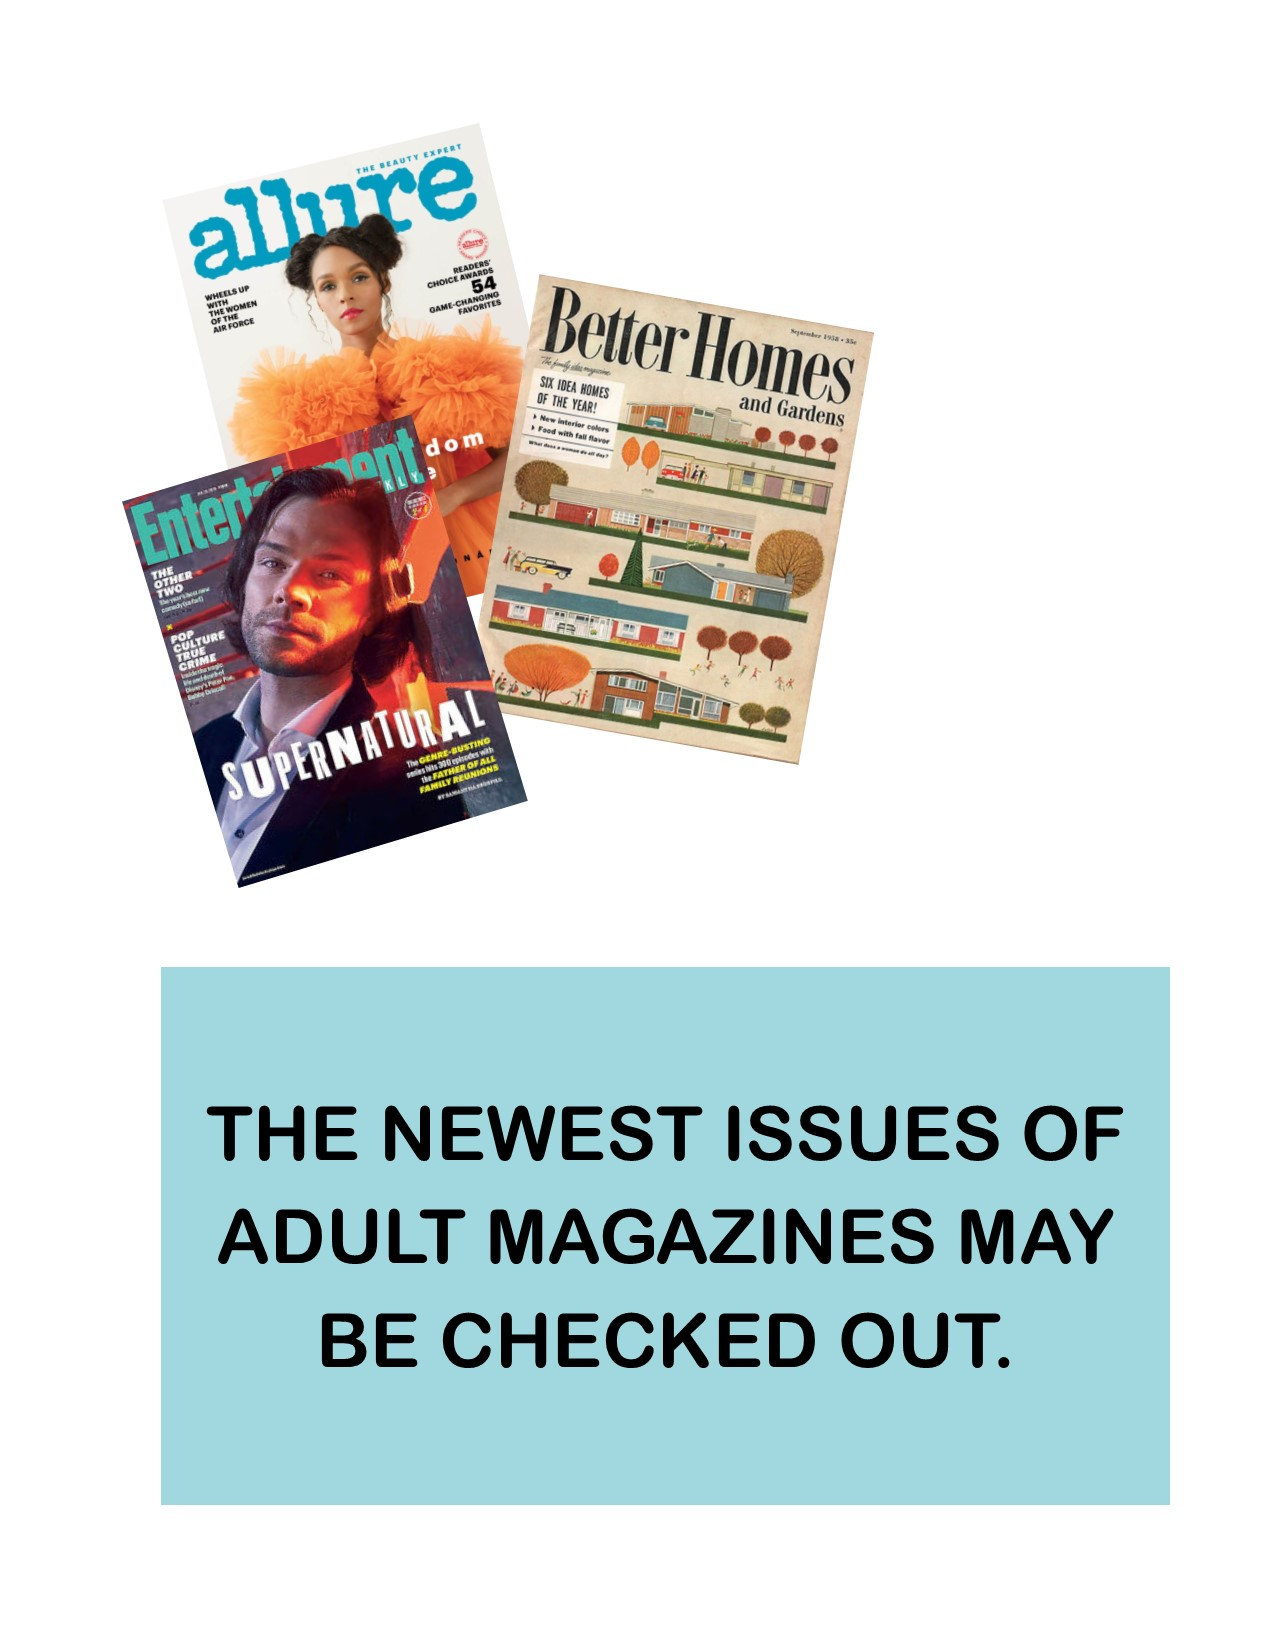 adult magazines